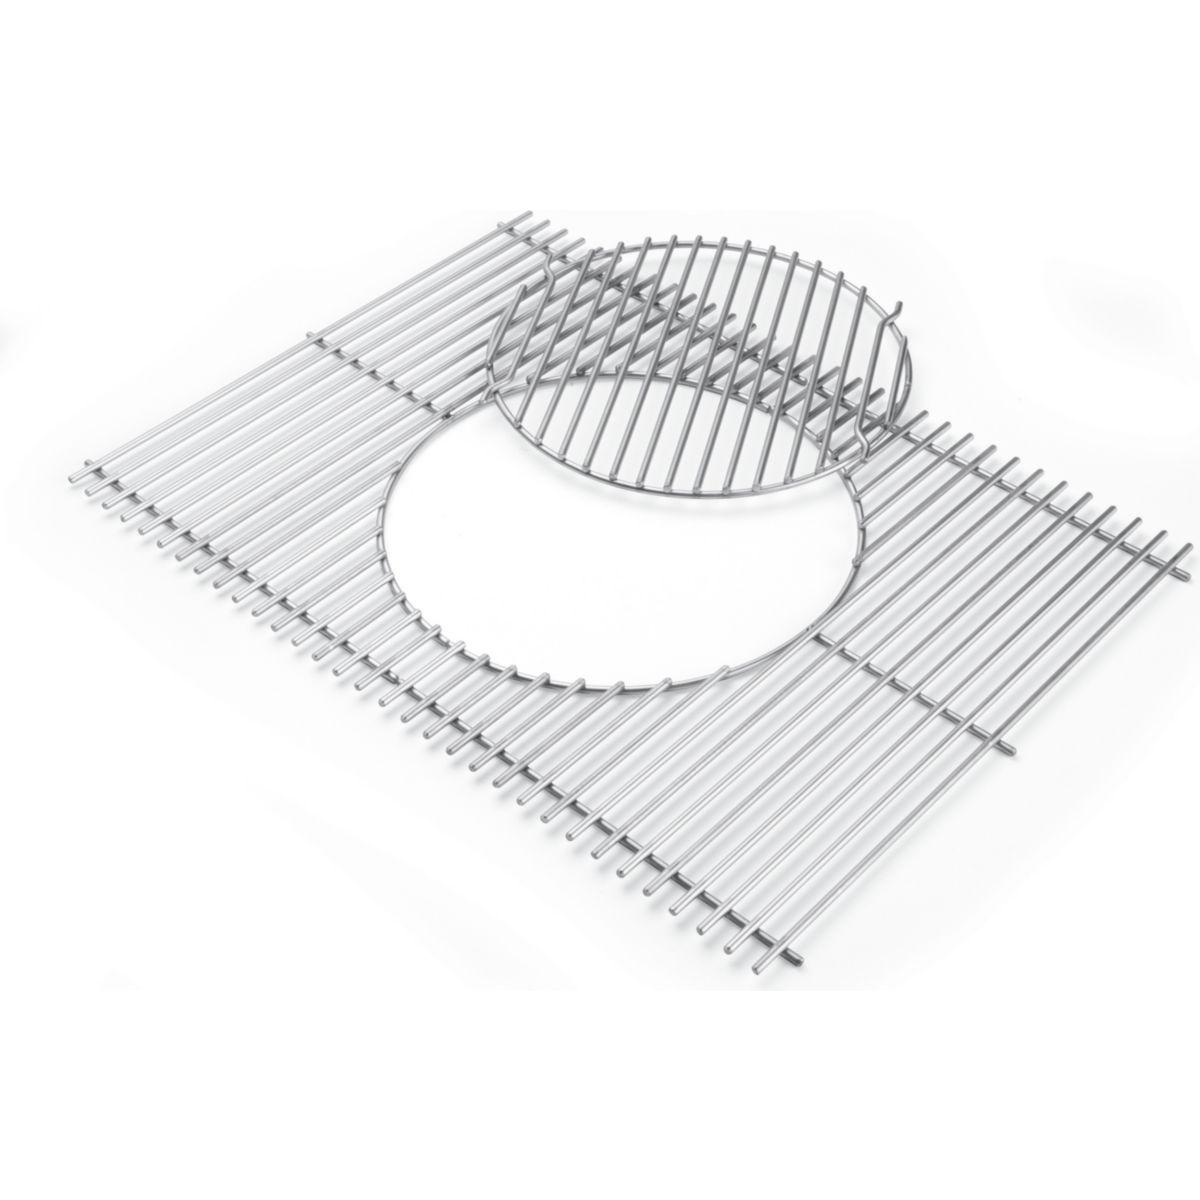 Grille weber grille gourmet bbq system - livraison offerte : code livprem (photo)